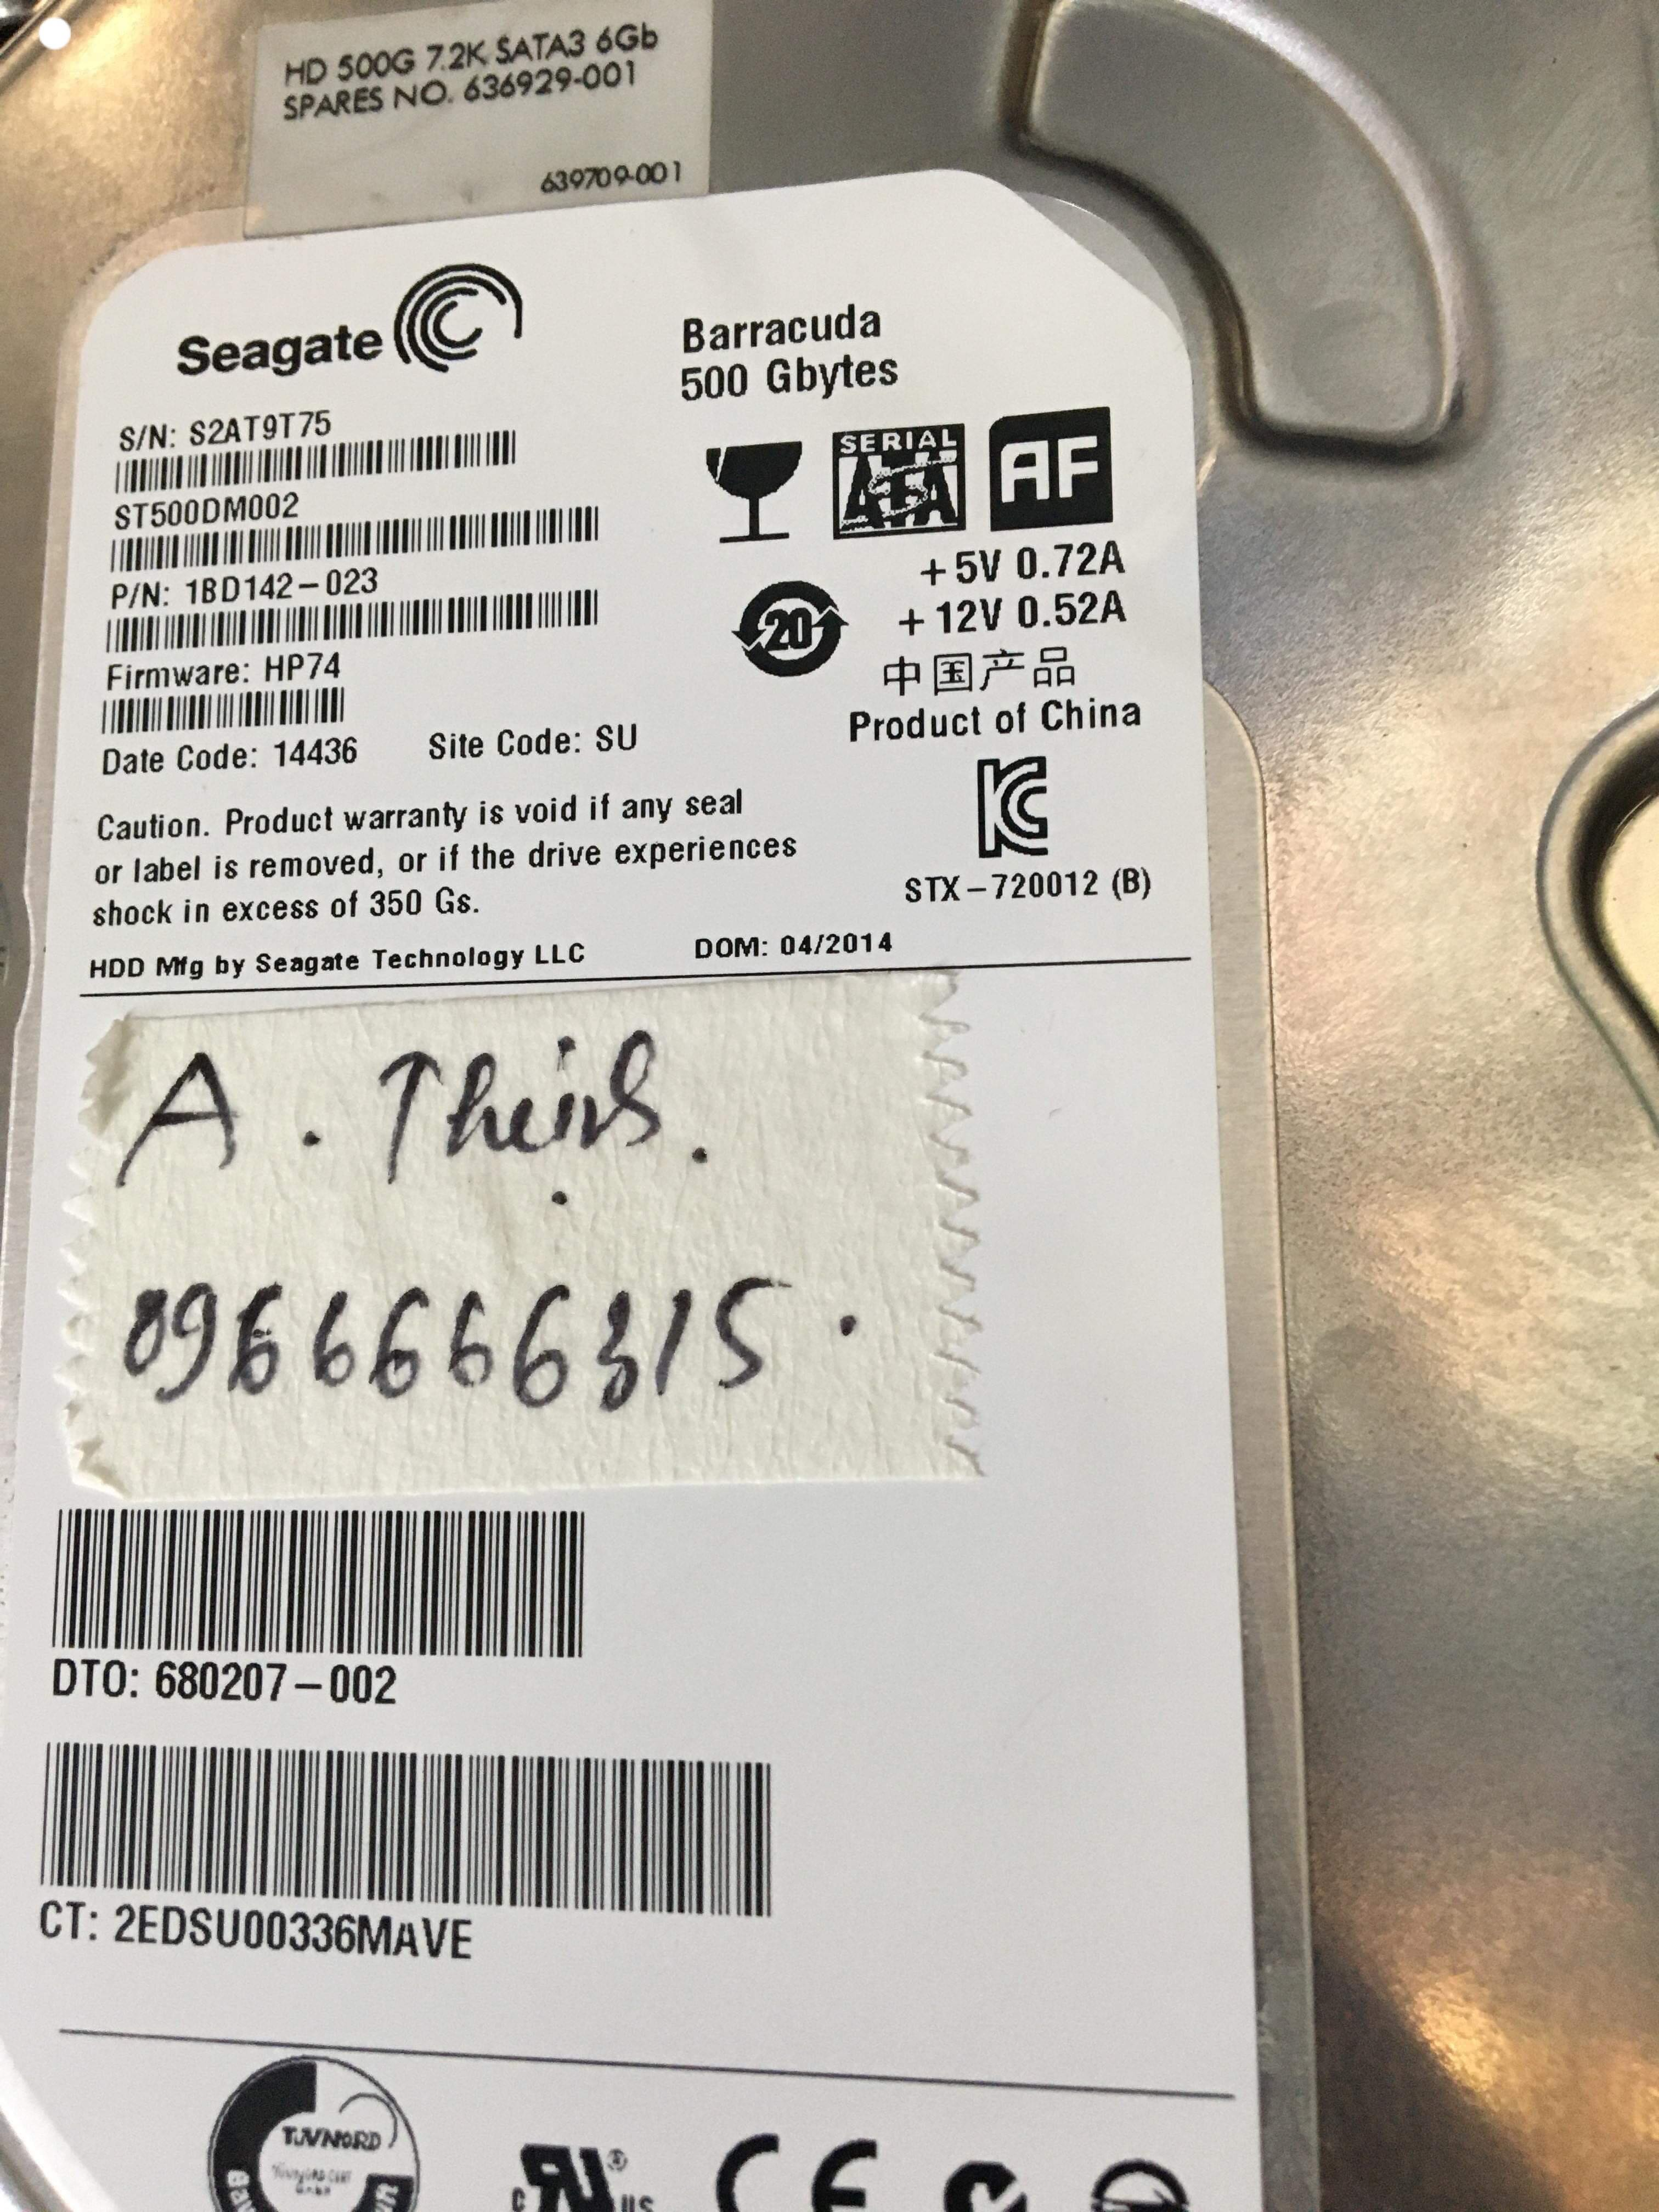 Phục hồi dữ liệu ổ cứng Seagate 500GB lỗi cơ 27/09/2019 - cuumaytinh